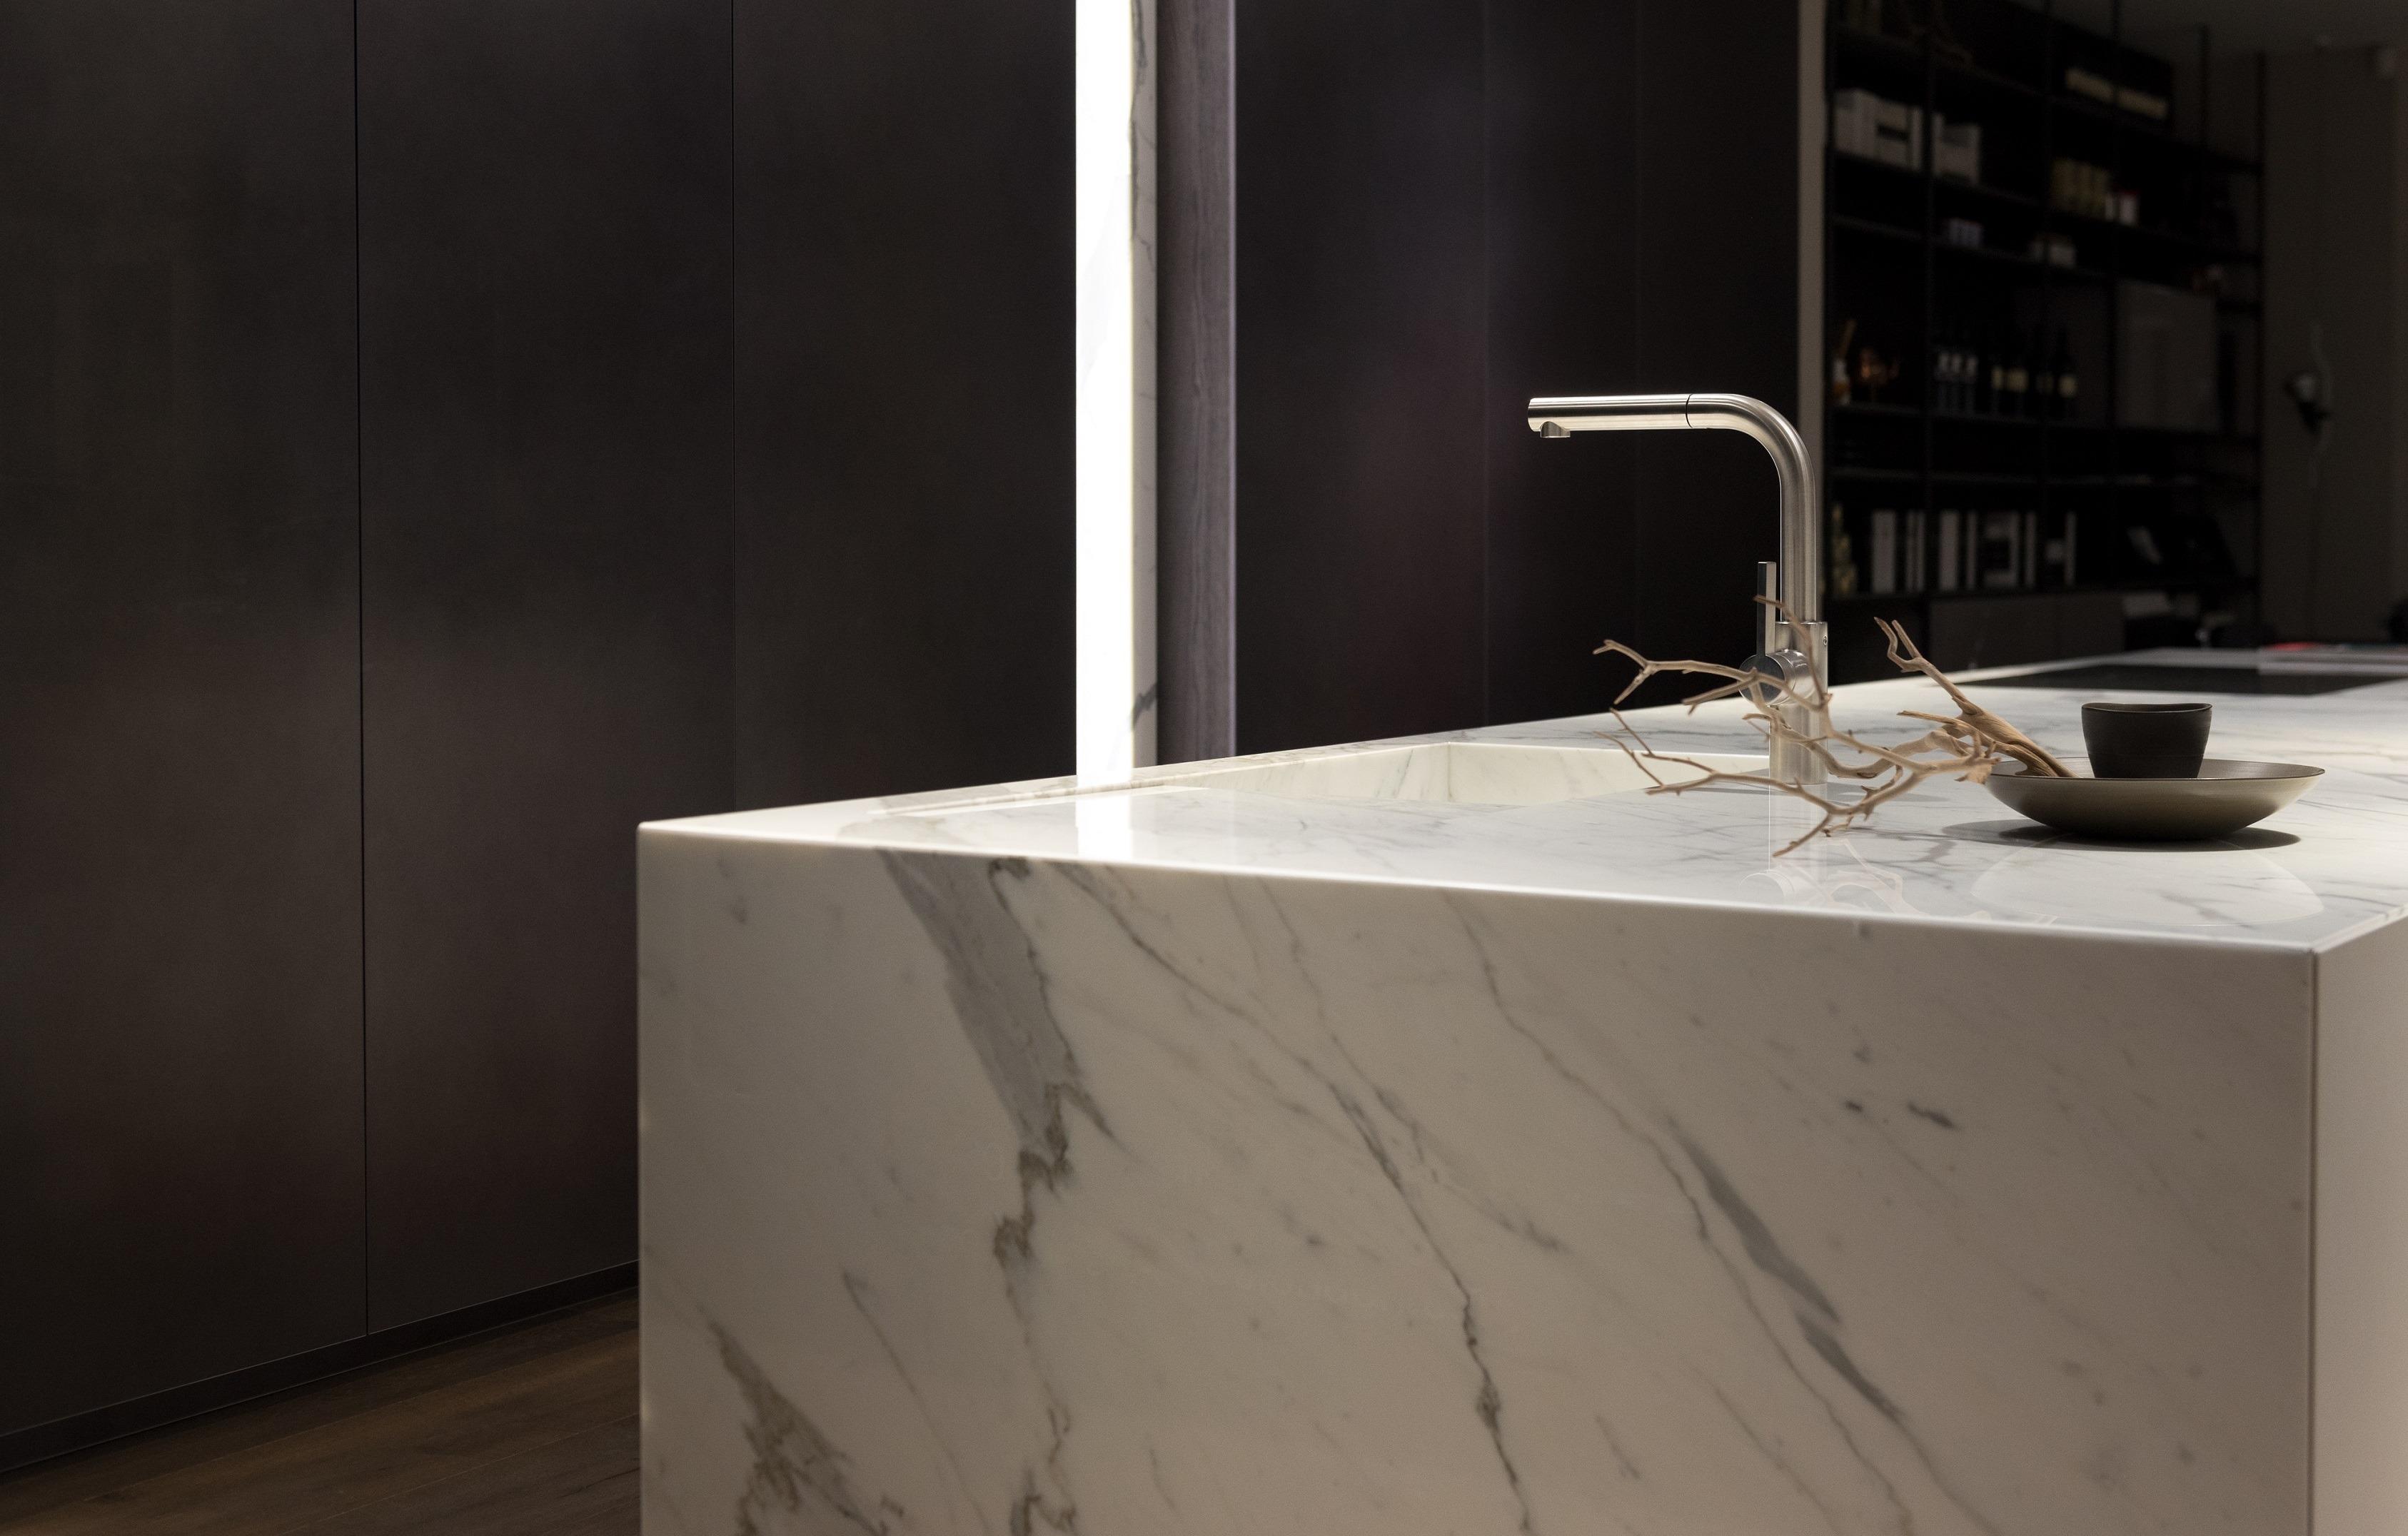 White marble countertop on dark background